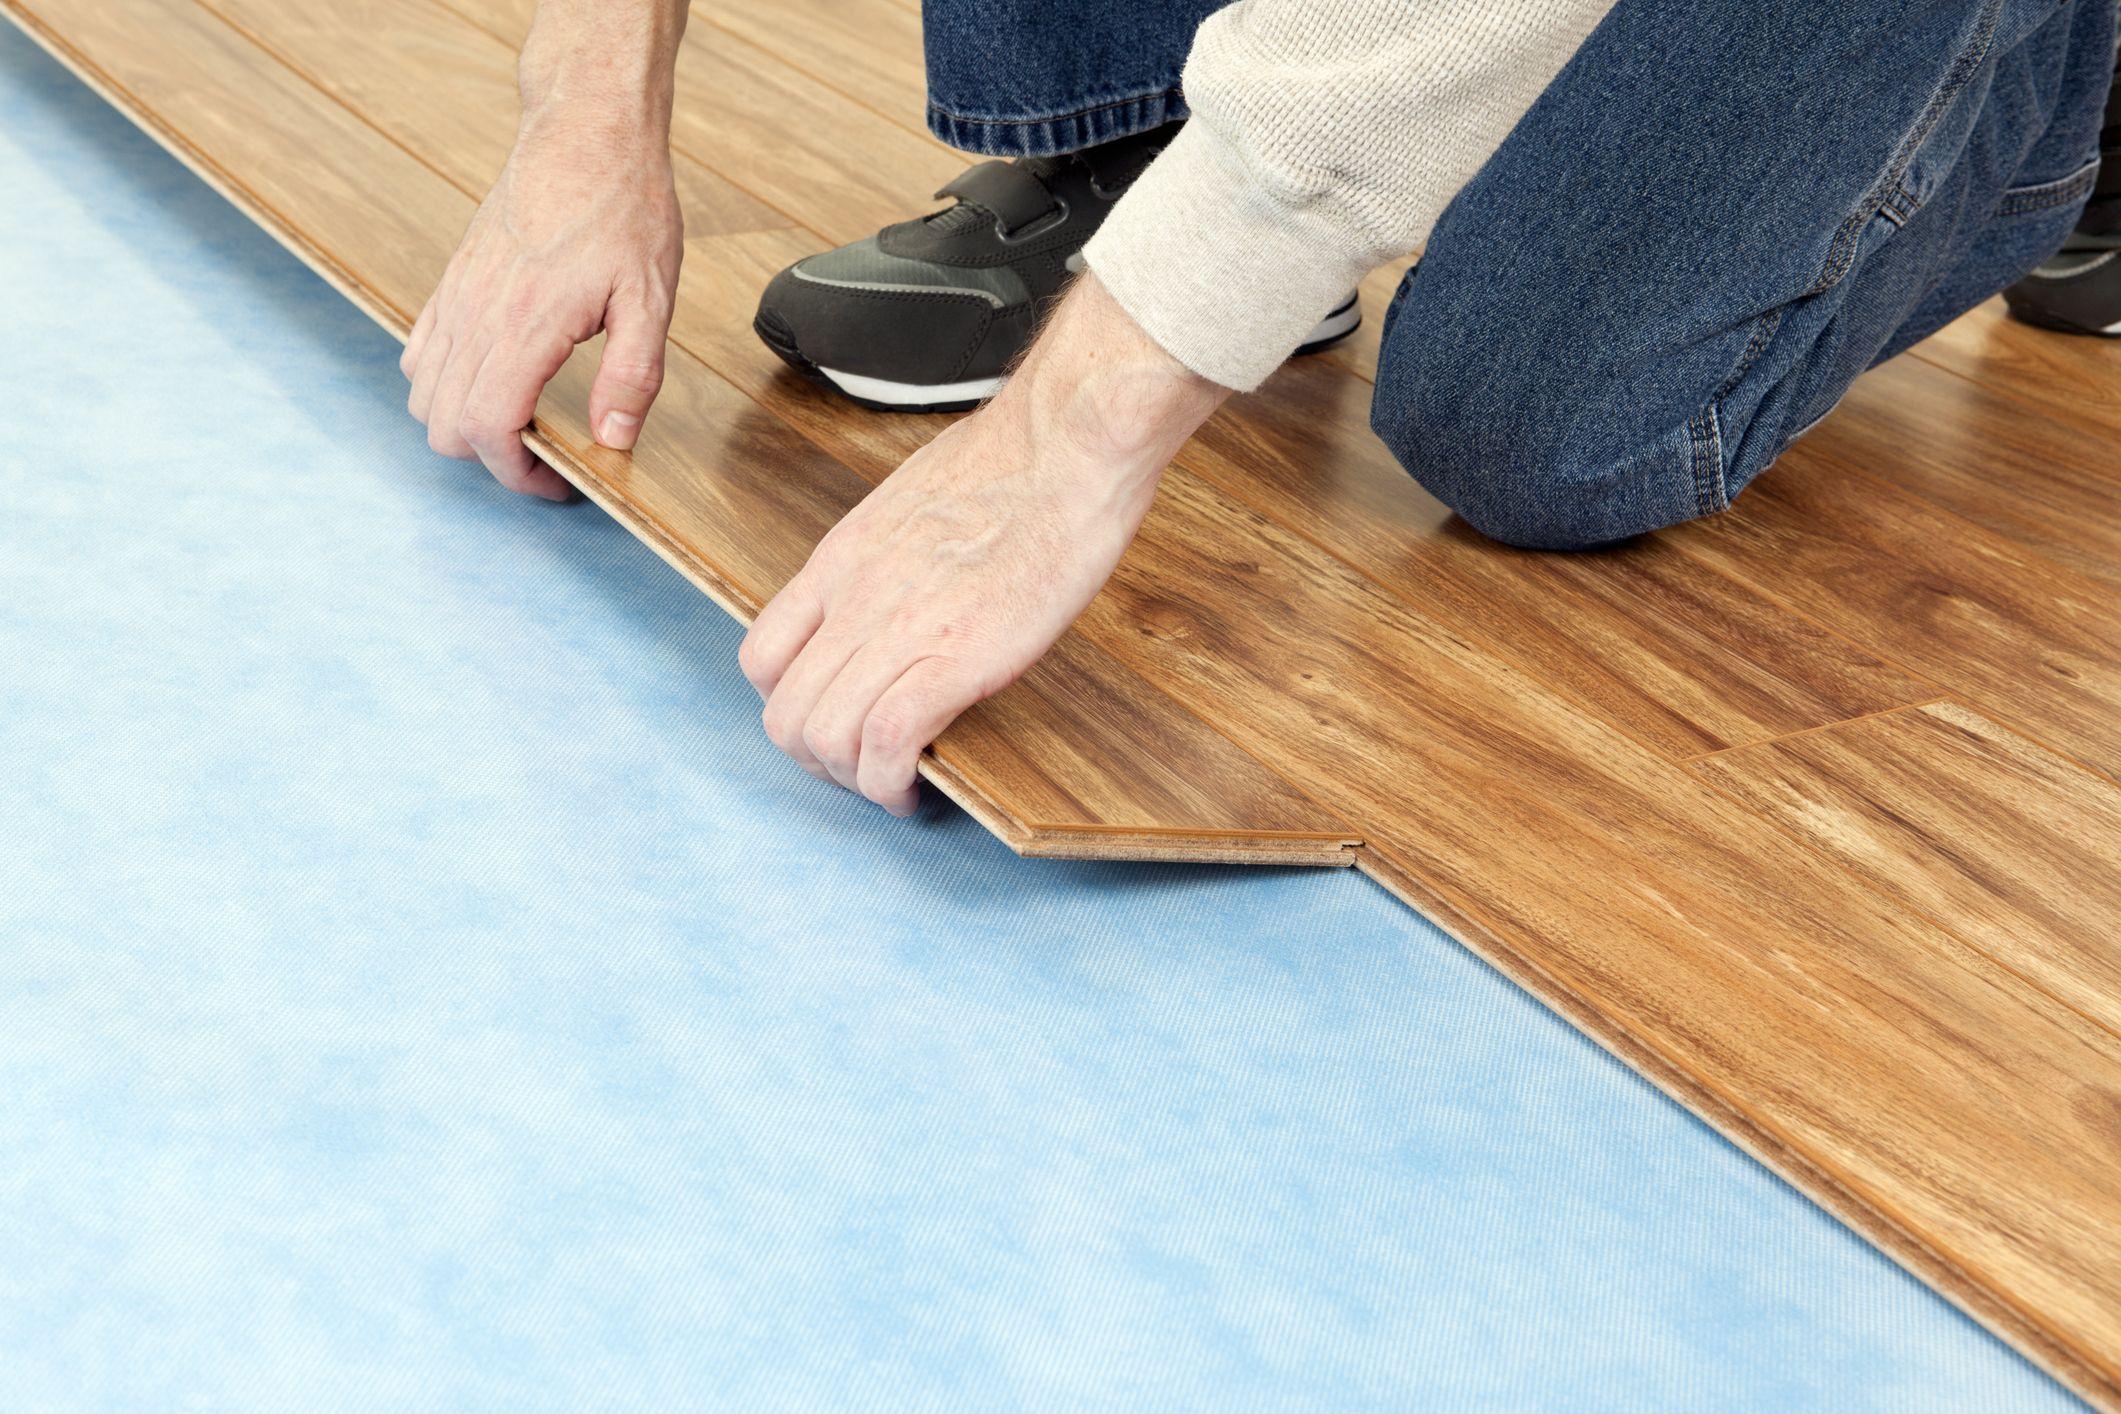 Vinyl Vs Laminate Flooring Comparison Guide Basement Flooring Options Vinyl Sheet Flooring Vinyl Flooring Kitchen